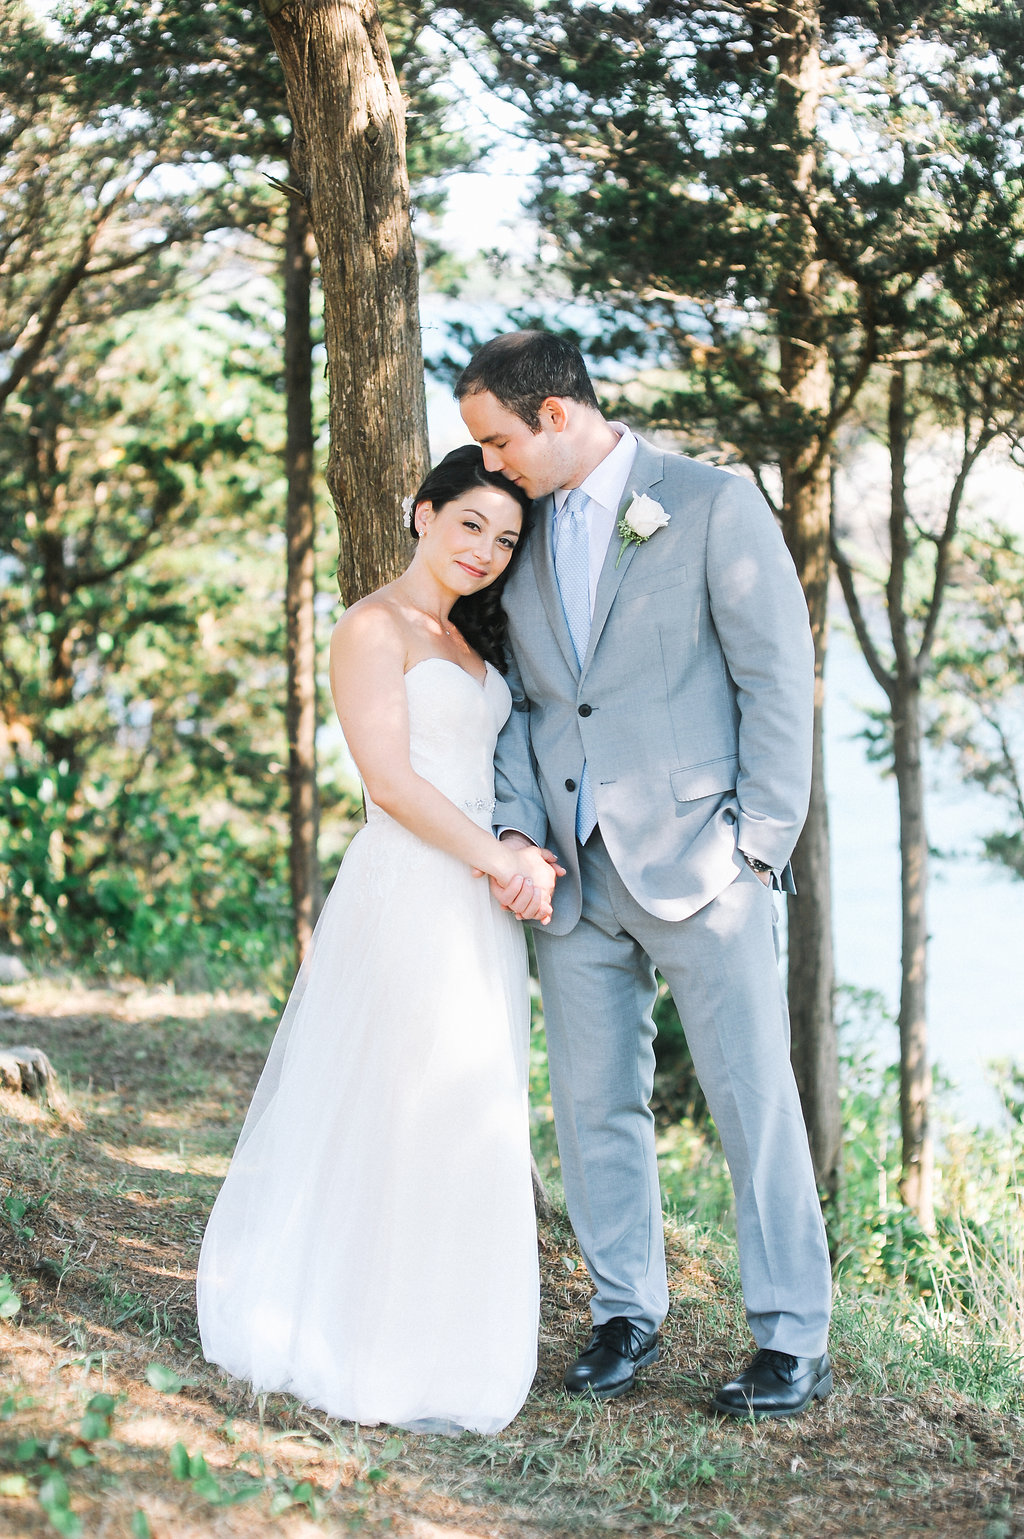 BrideGroomPortraits_Dragonline_Studios_Jamestown_RI_Wedding-20.jpg